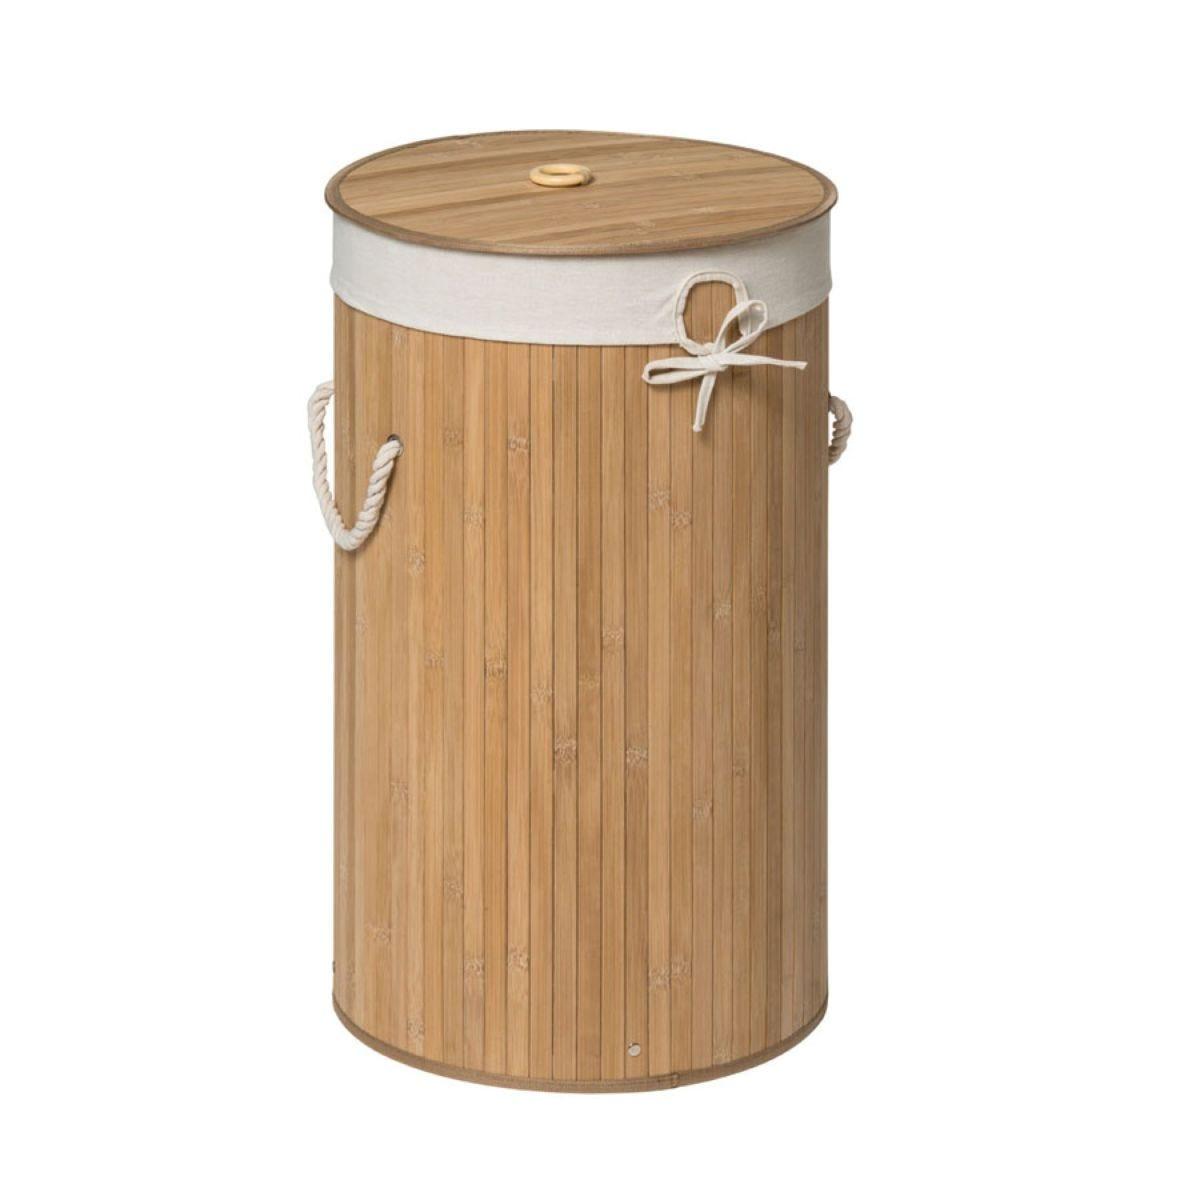 Premier Housewares Kankyo Bamboo Laundry Hamper - Natural